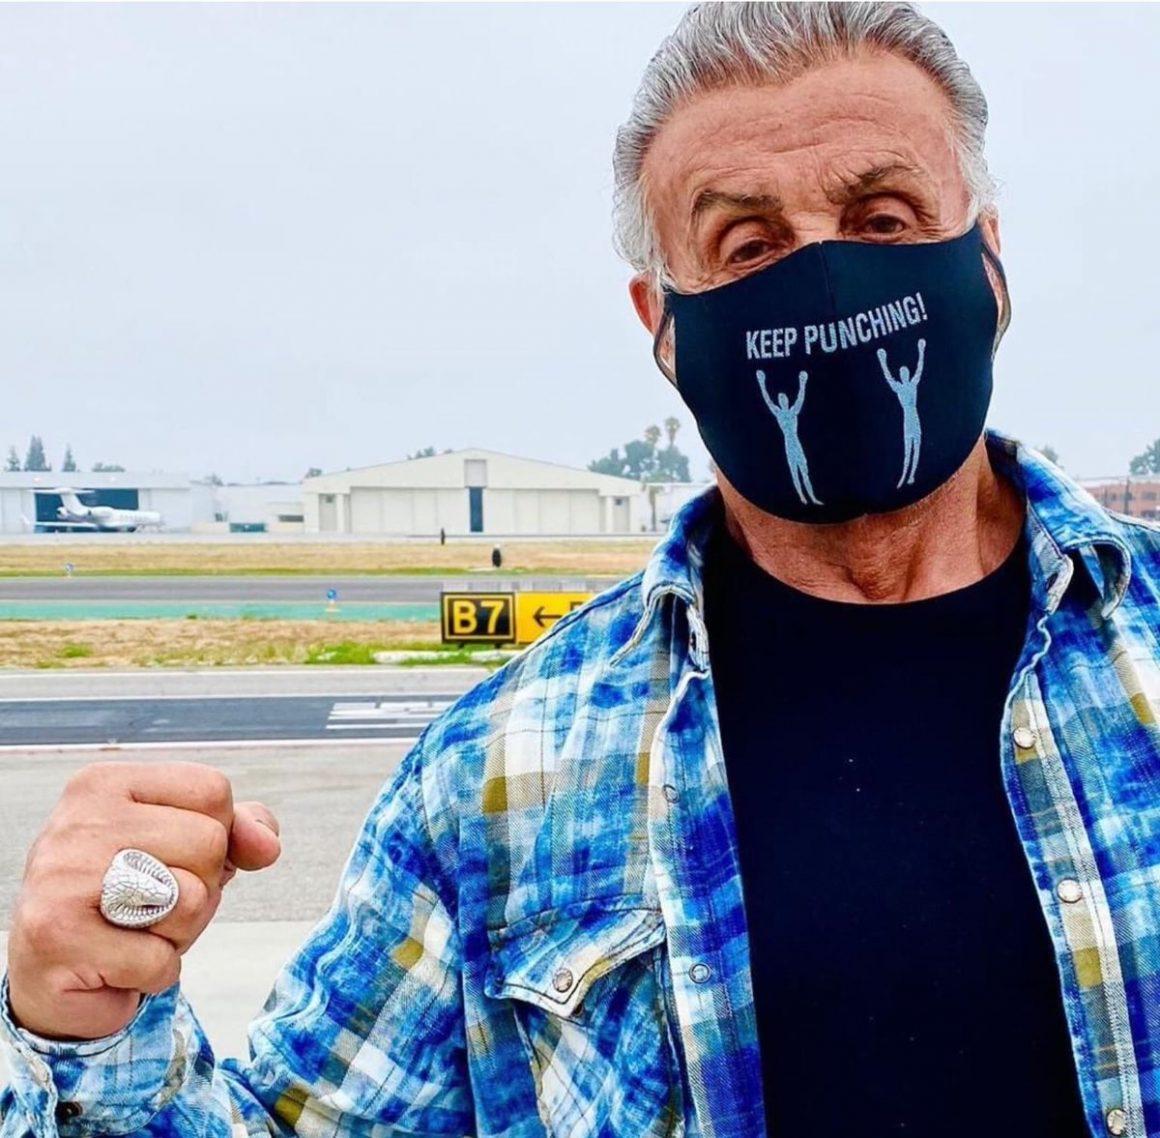 Sylvester Stallone porte son masque covid «keep punching» pour l'anniversaire de sa fille